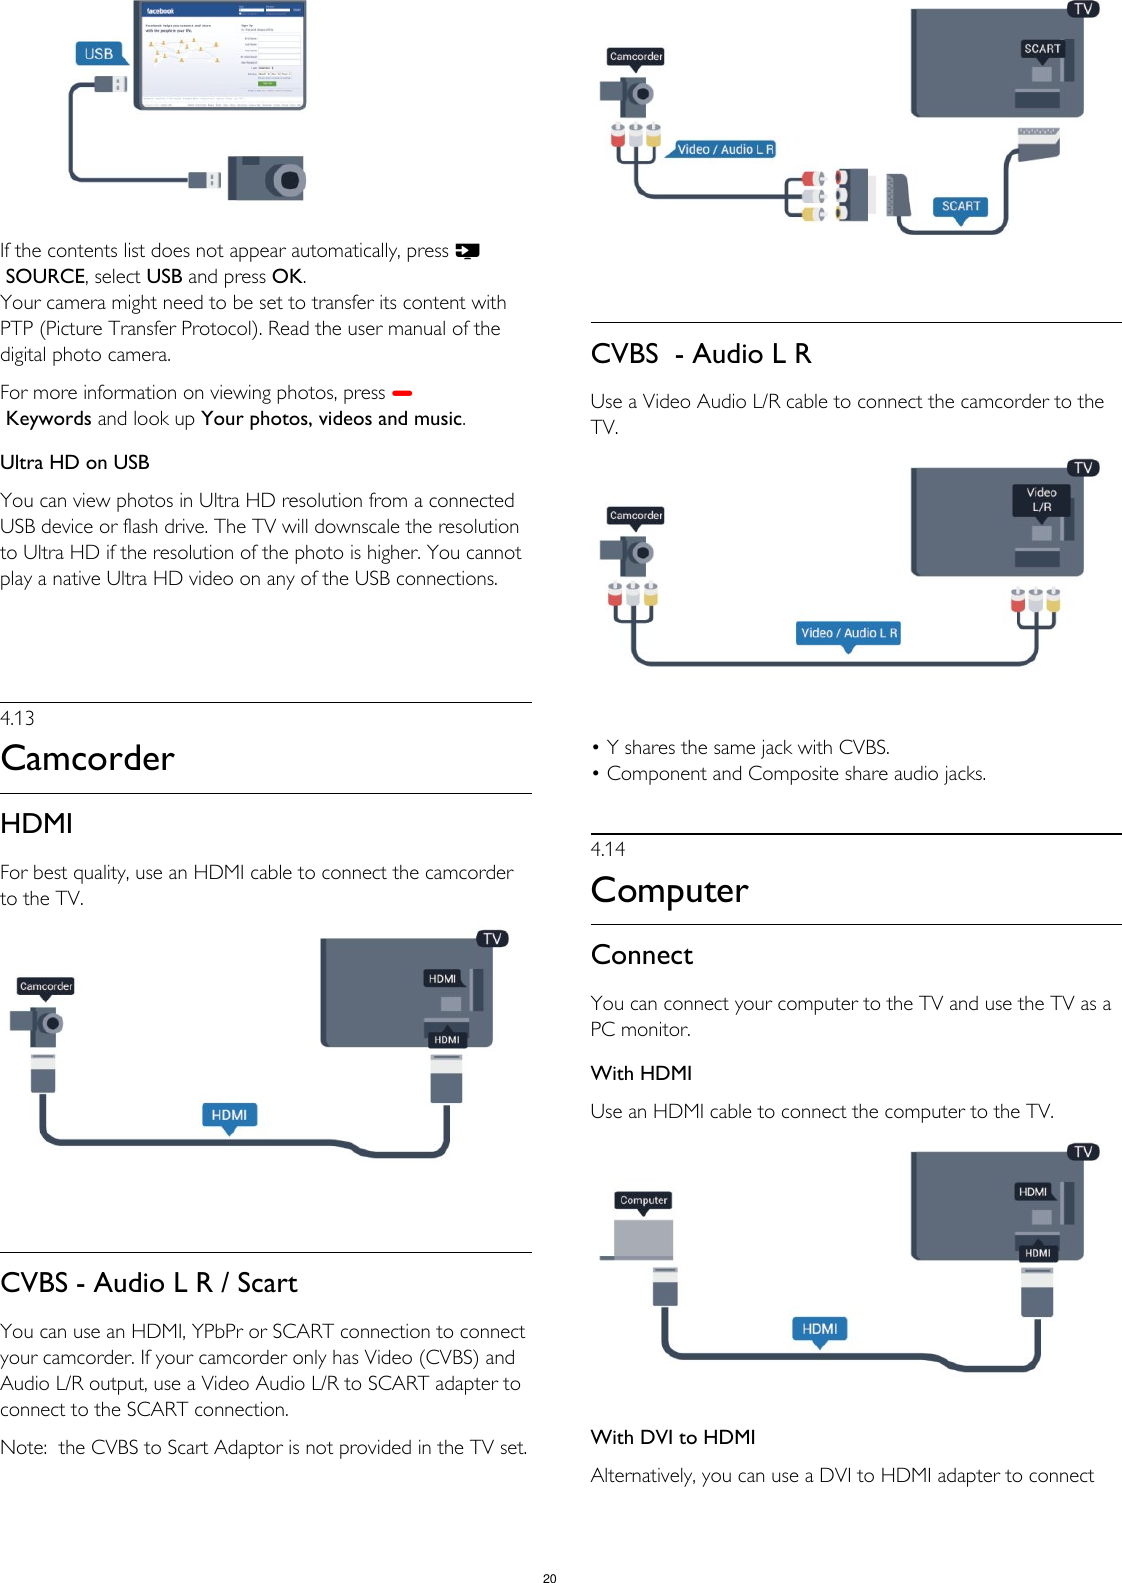 Philips User Manual 32pft6549 60 Dfu Eng